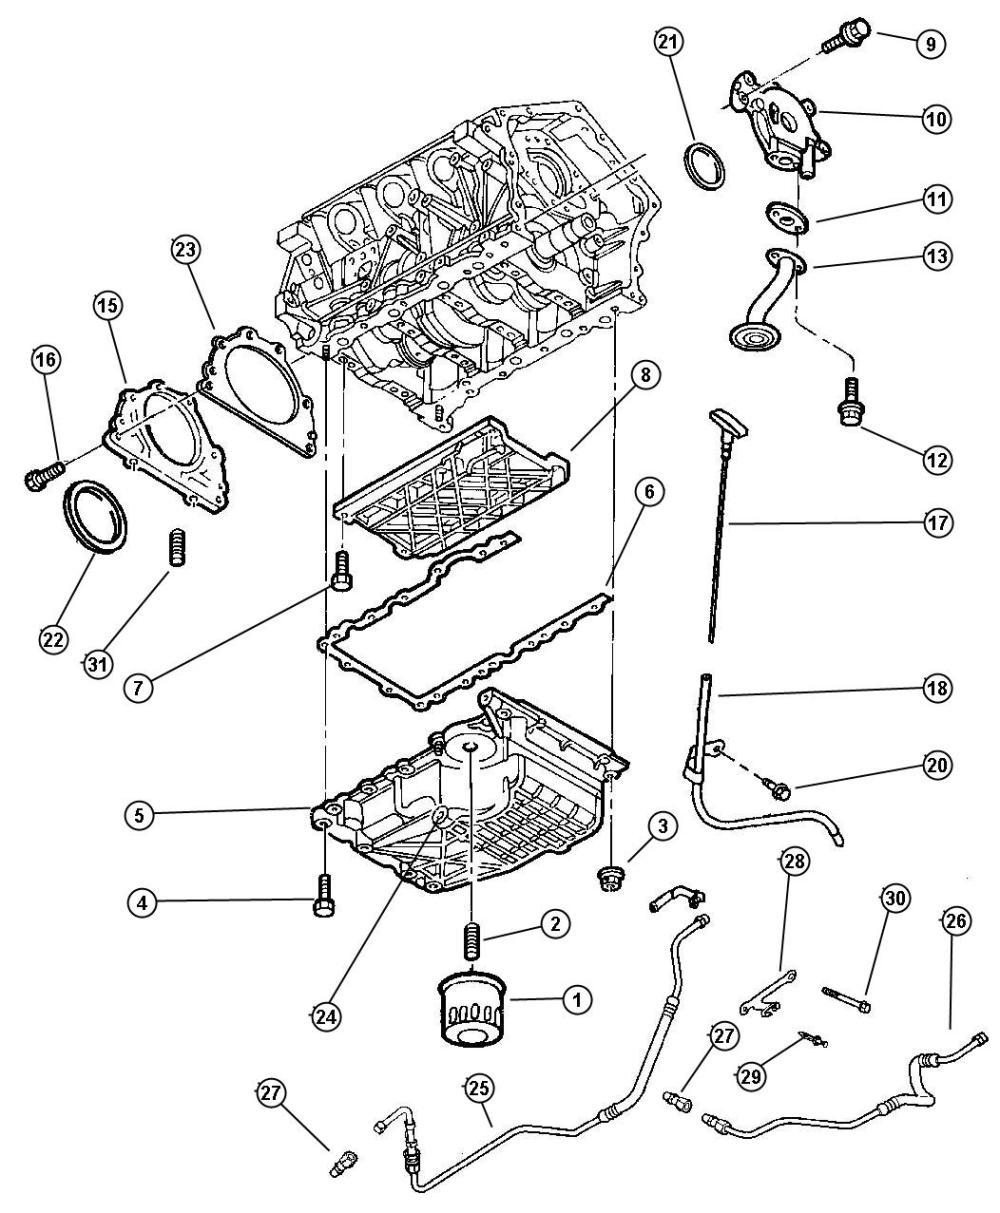 medium resolution of dodge 2 7 engine diagram 2carpros questions get free